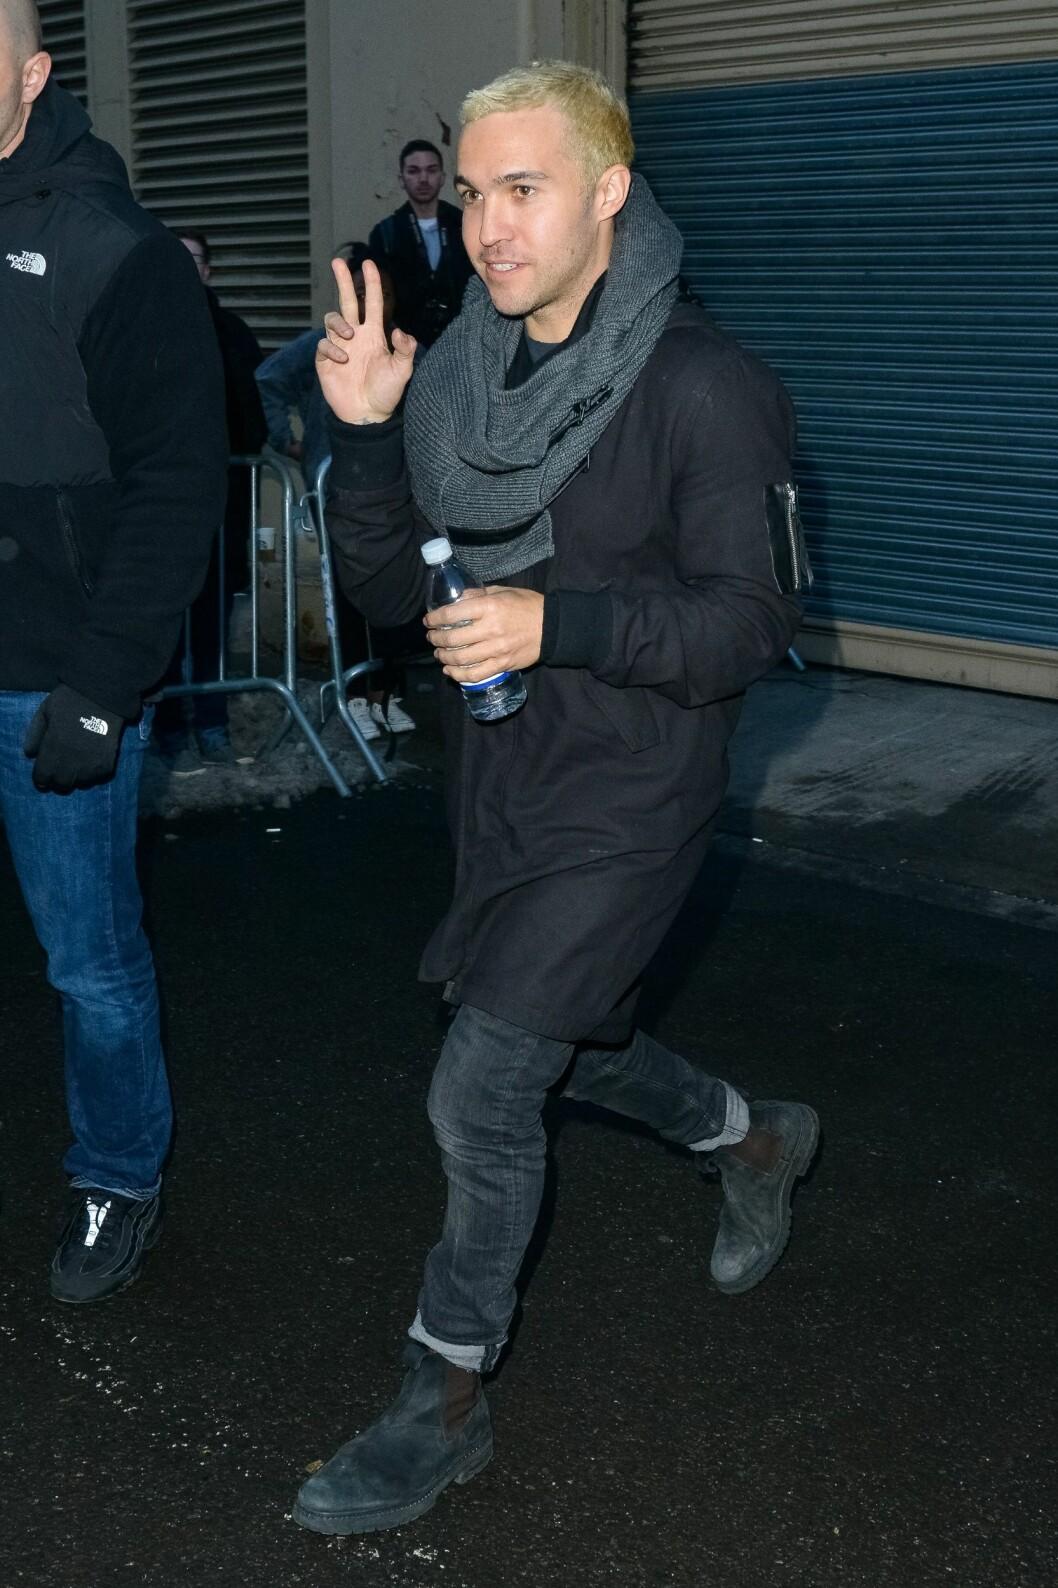 BLANT GJESTENE: Fall Out Boy-bassist Pete Wentz ankommer Kanye West x Adidas-show i New York. Foto: MediaPunch/REX/All Over Press